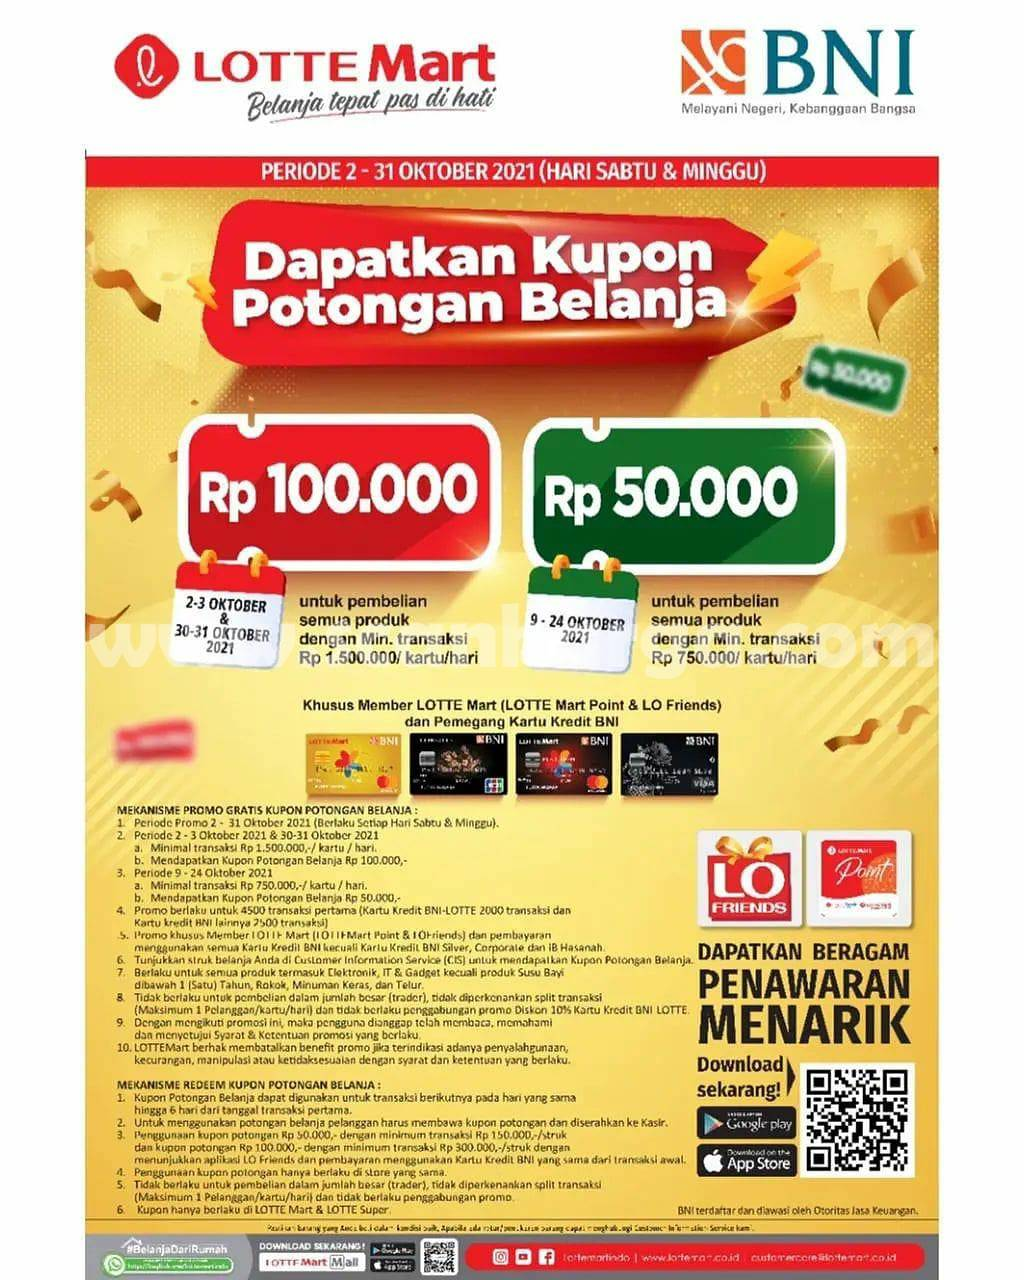 LOTTEMART Promo Kupon Potong Belanja Rp. 100.000 dengan Kartu Kredit BNI